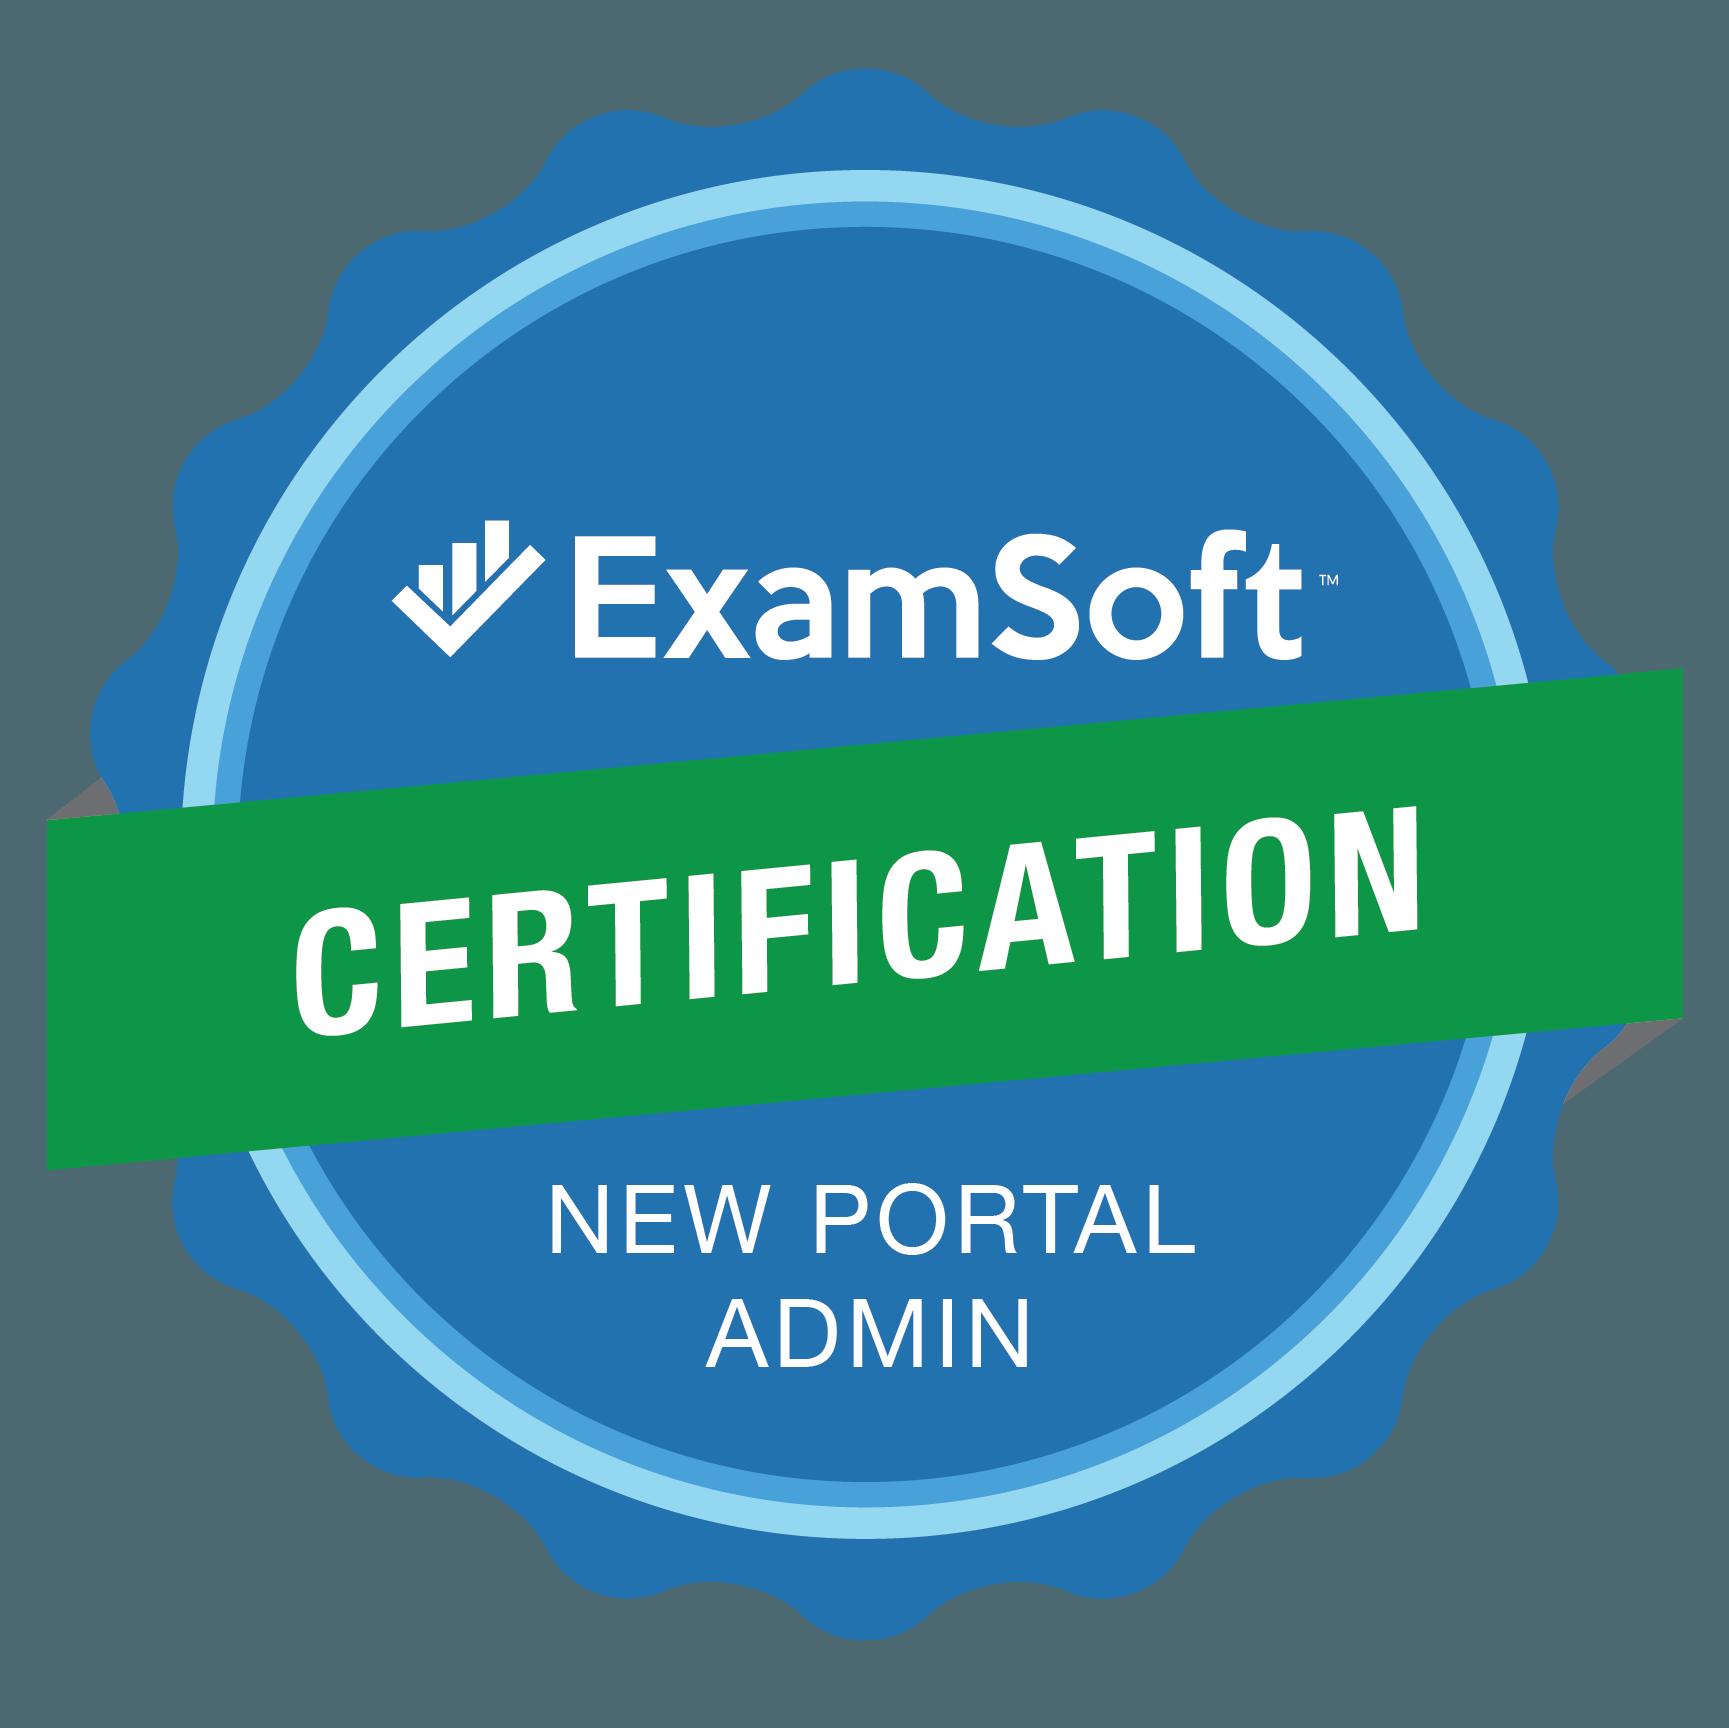 The ExamSoft Certification New Portal Admin Program Badge